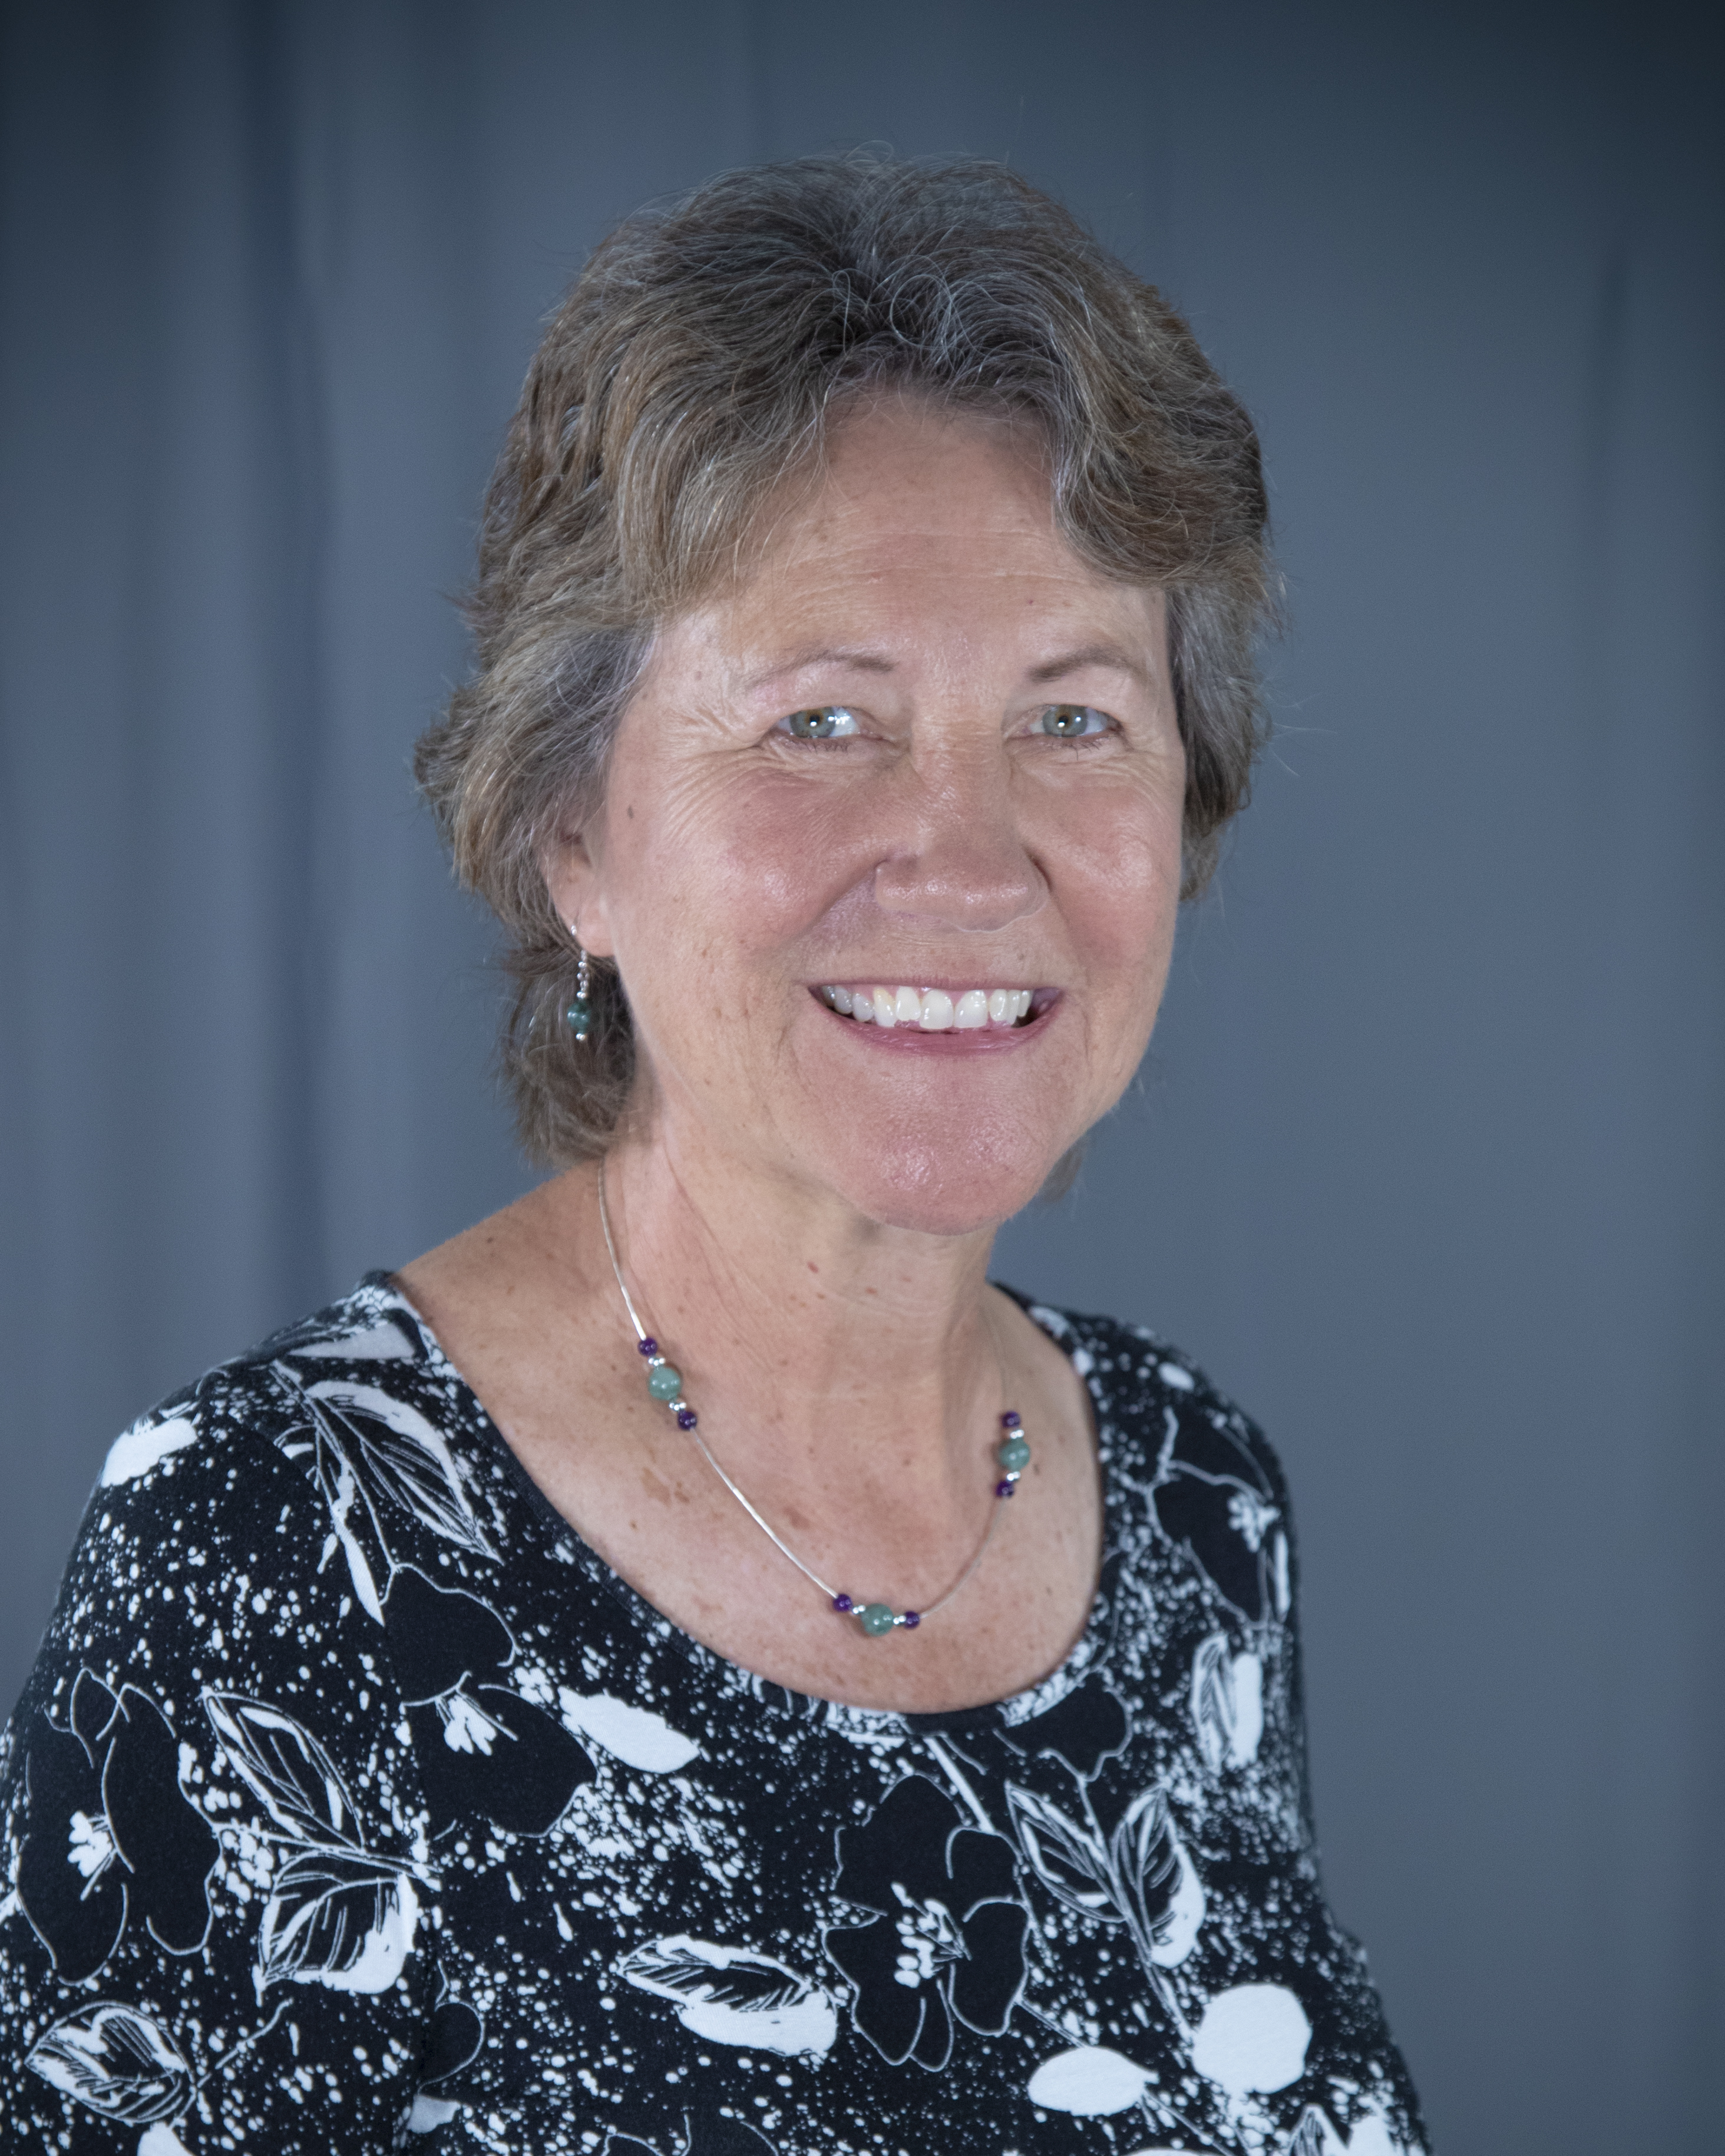 Kathy Plath